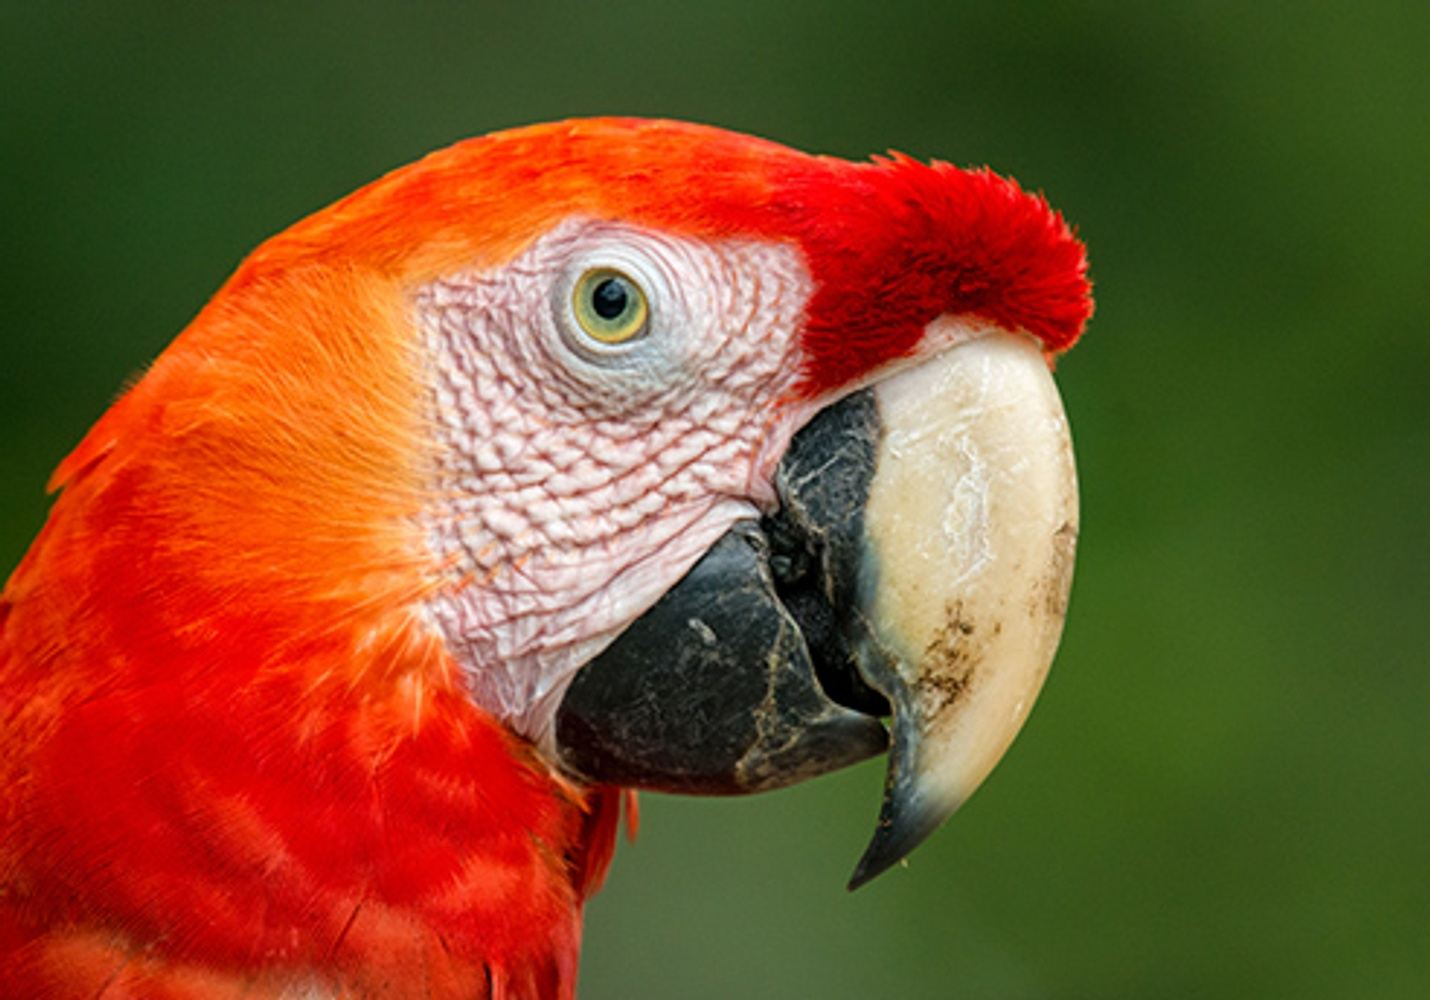 Birdwatching in Peru: Cuzco and Manu Lowlands Tour